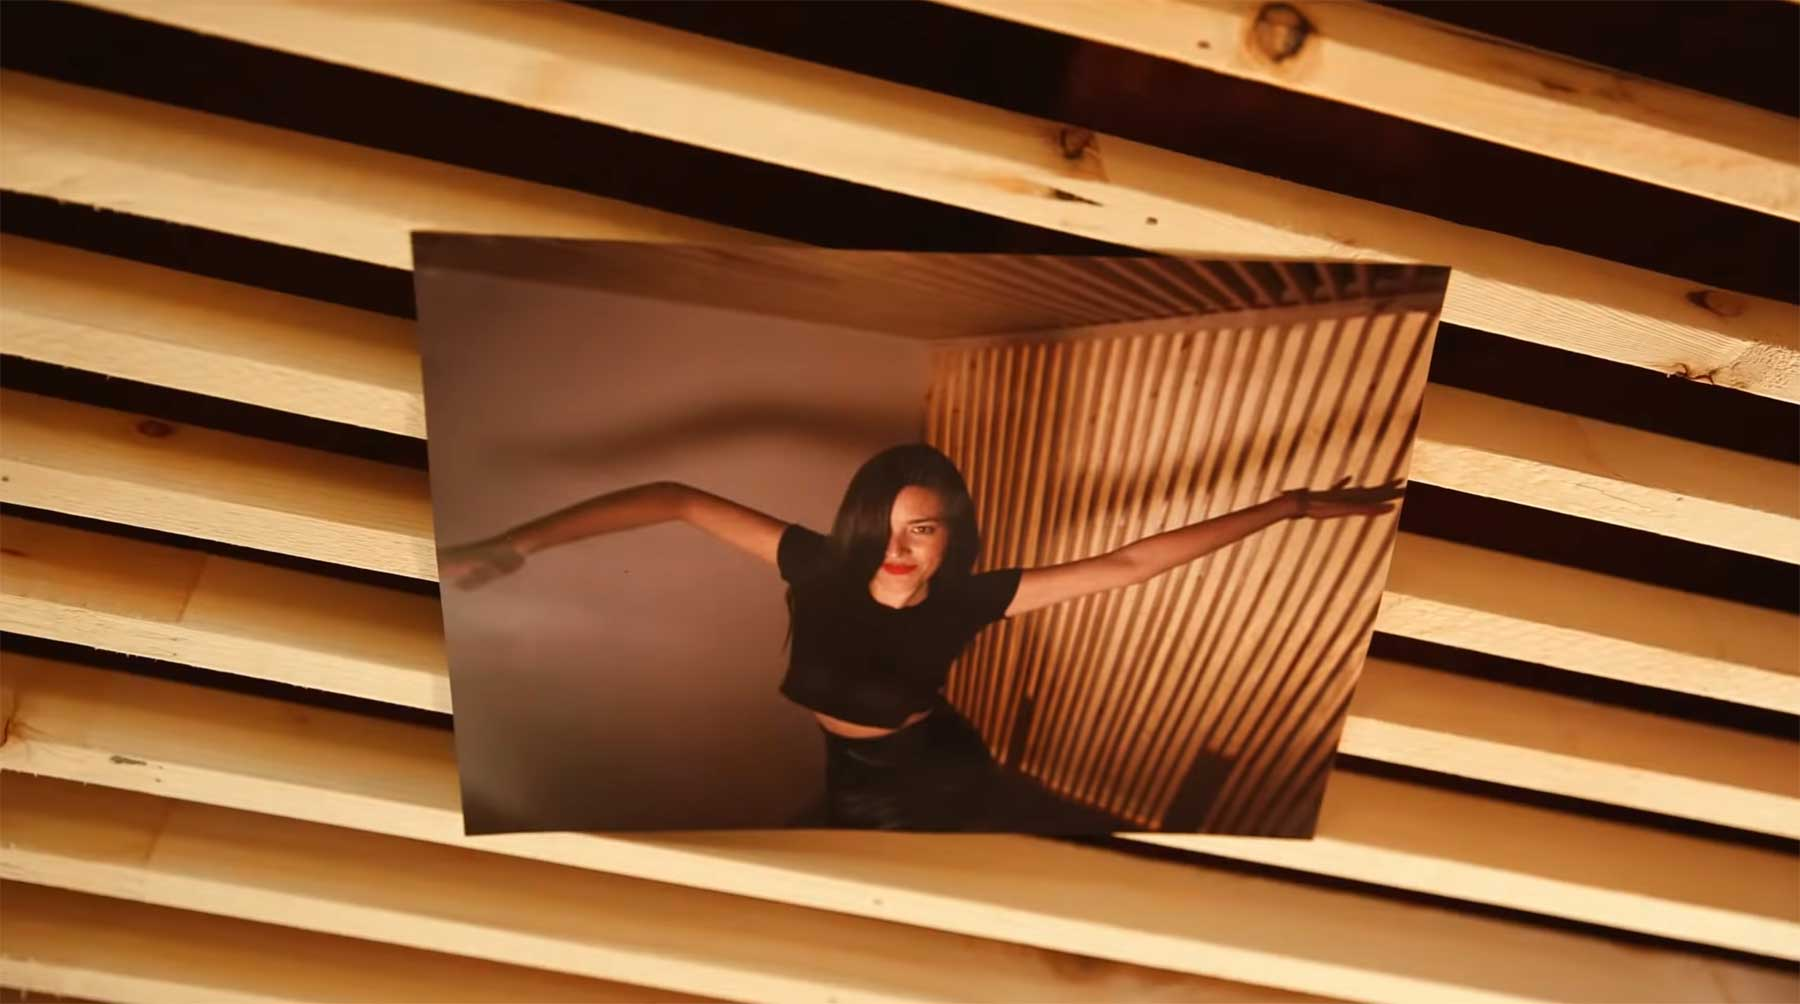 Musikvideo-Stopmotion mit 2.250 Fotodrucken said-the-whale-unamerican-musikvideo